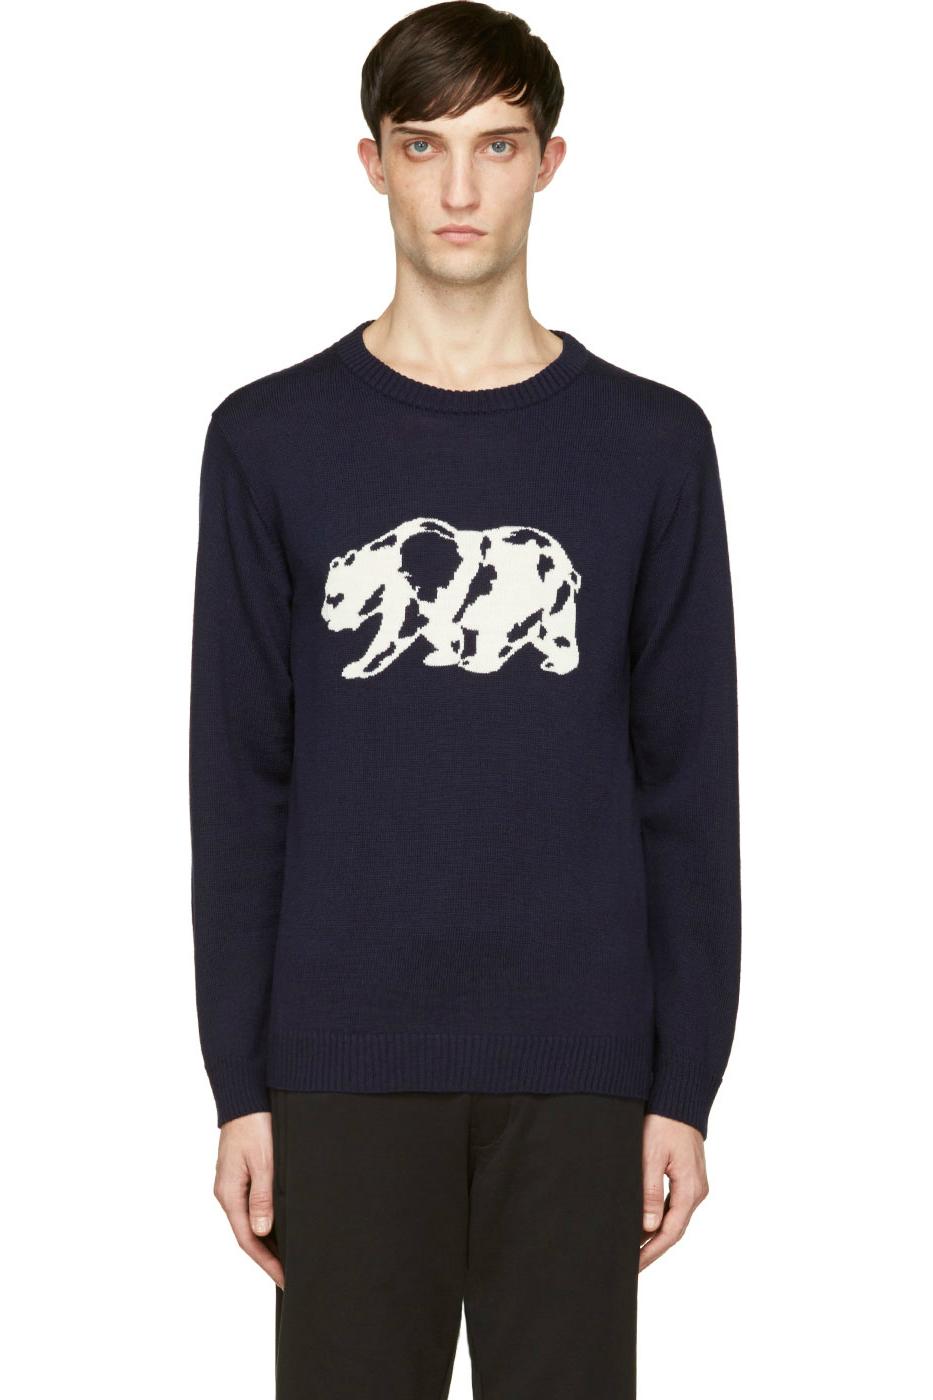 Мужской синий свитер с круглым воротником и рисунком белого медведя White Mountaineering